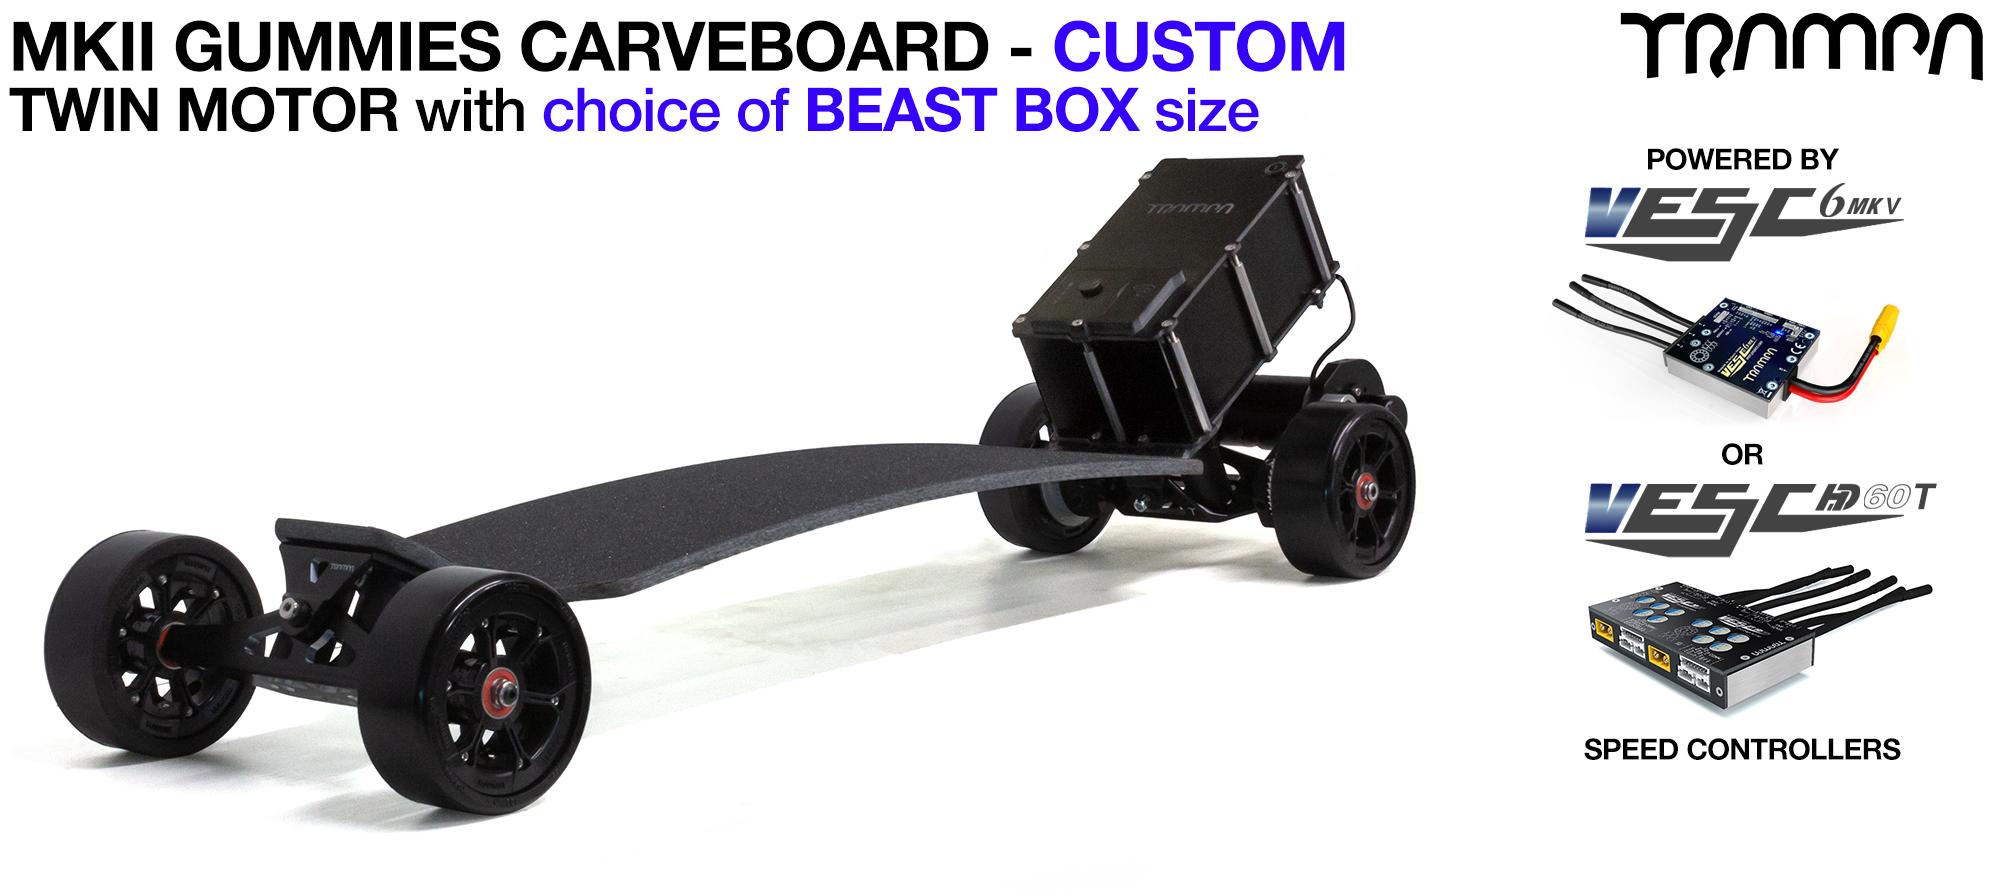 TRAMPA's MkII Electric GUMMIES Carveboard - uses Mini Spring Trucks with MkII Carve board Motor Mount,s Custom TRAMPA hubs & 125mm GUMMIES longboard Tyres - TWIN Motor CUSTOM